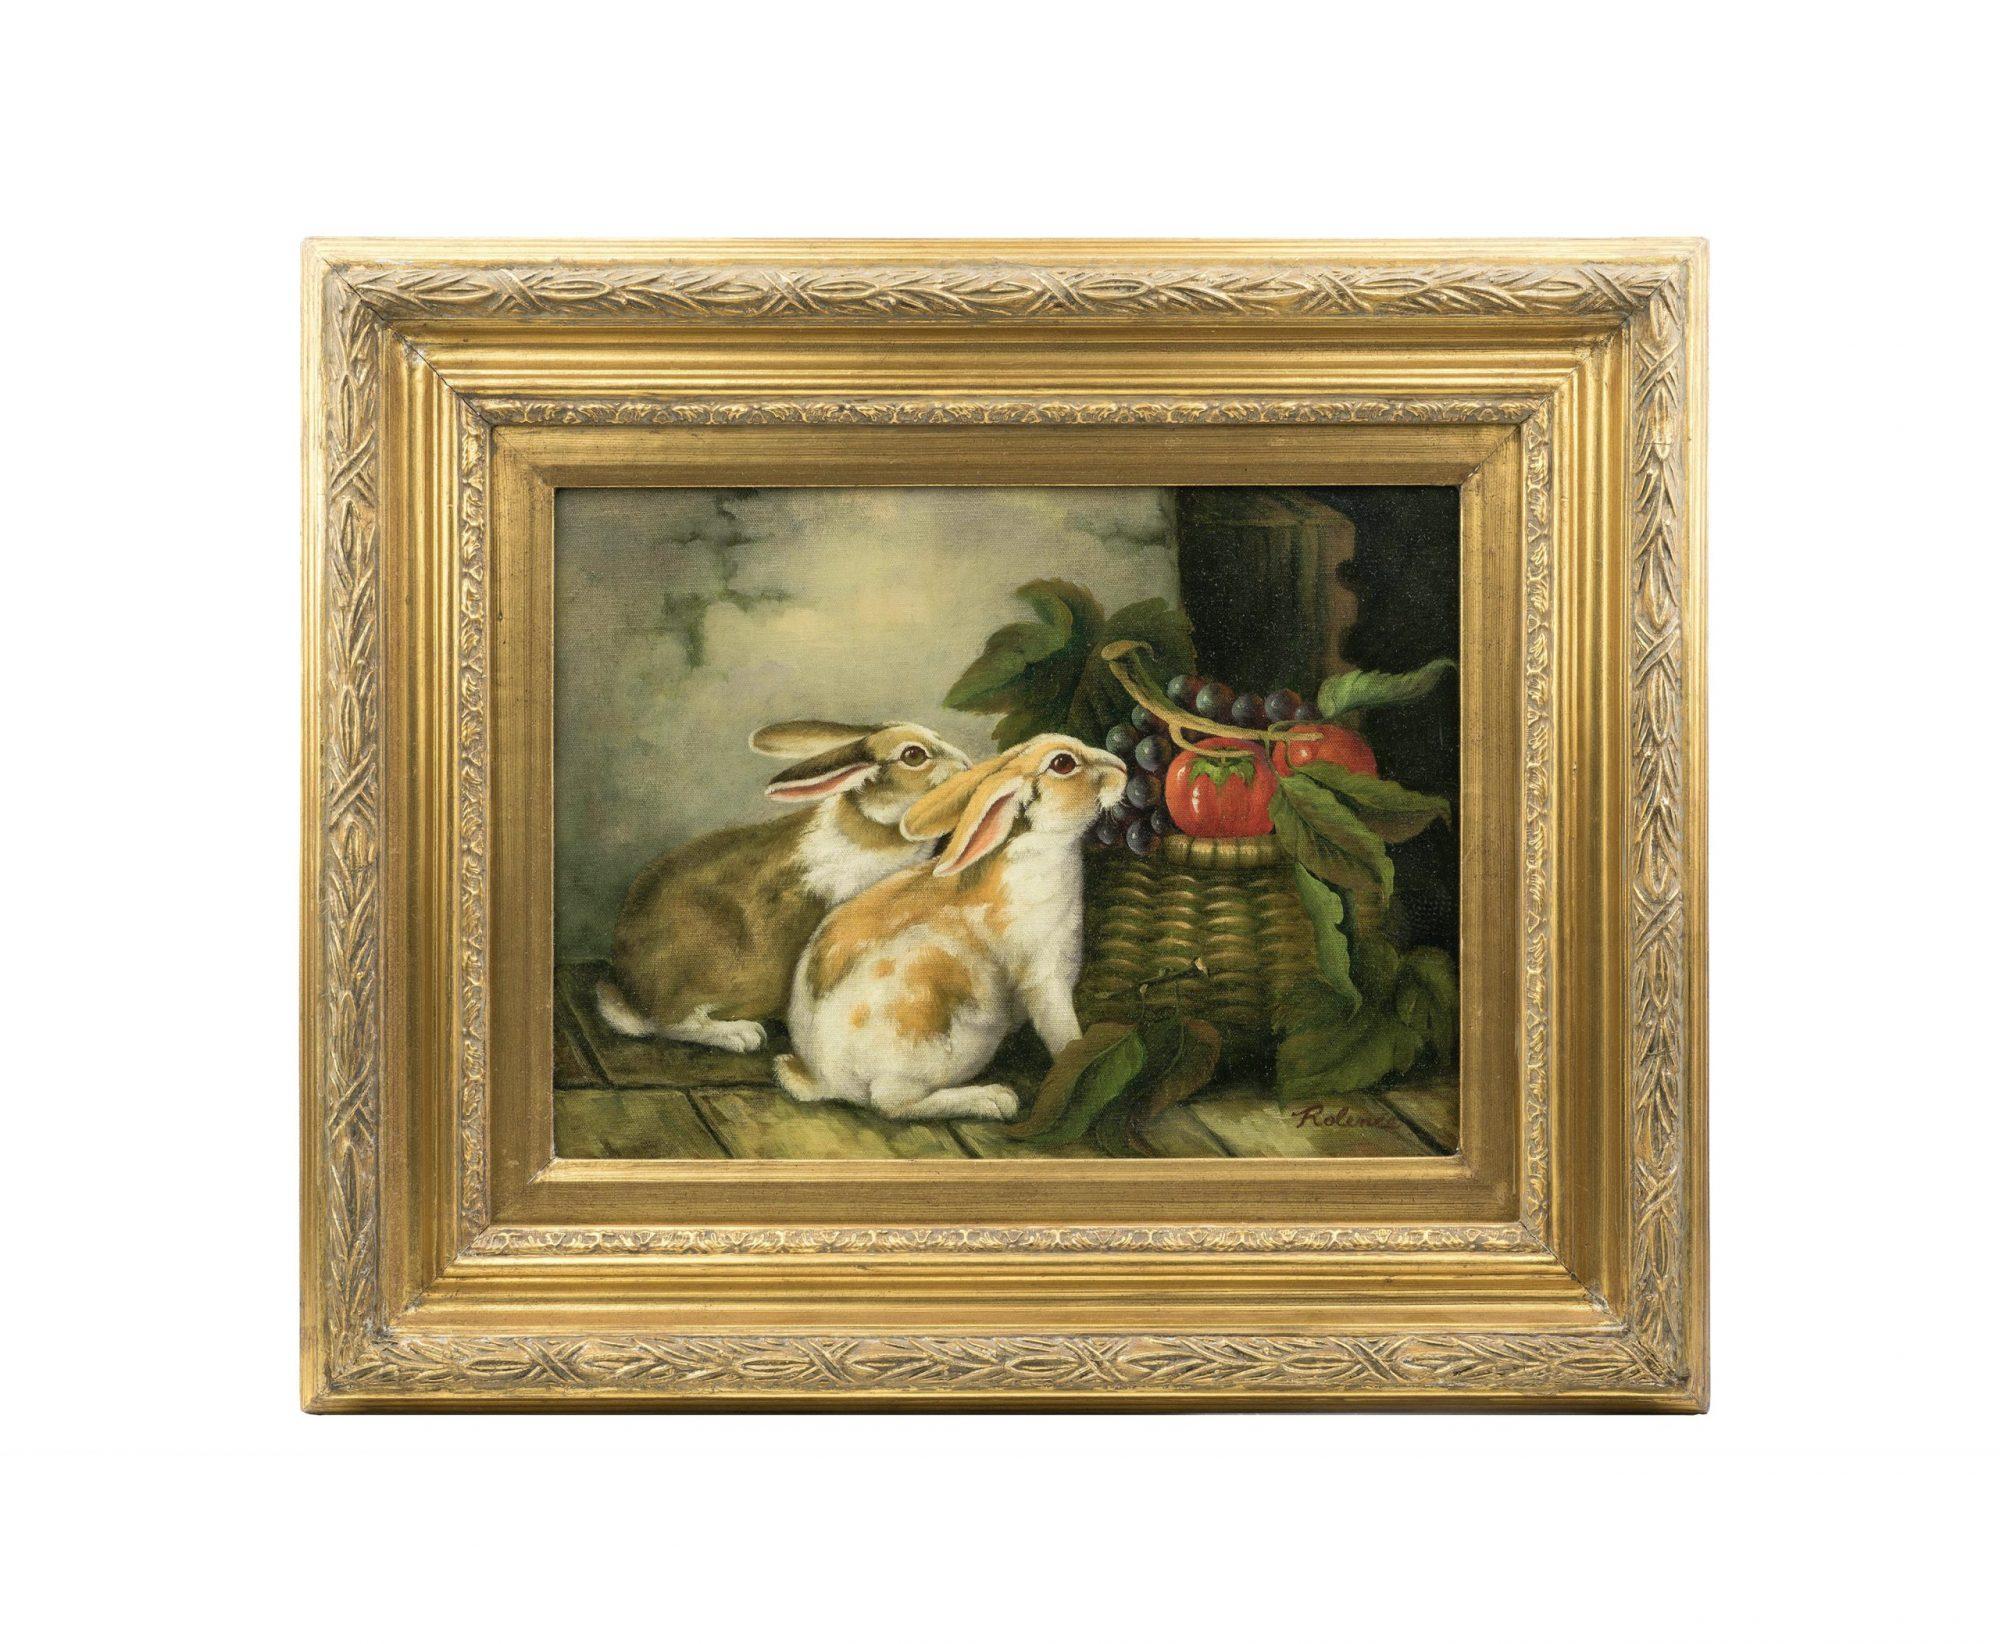 Still life painting rabbits feeding scene